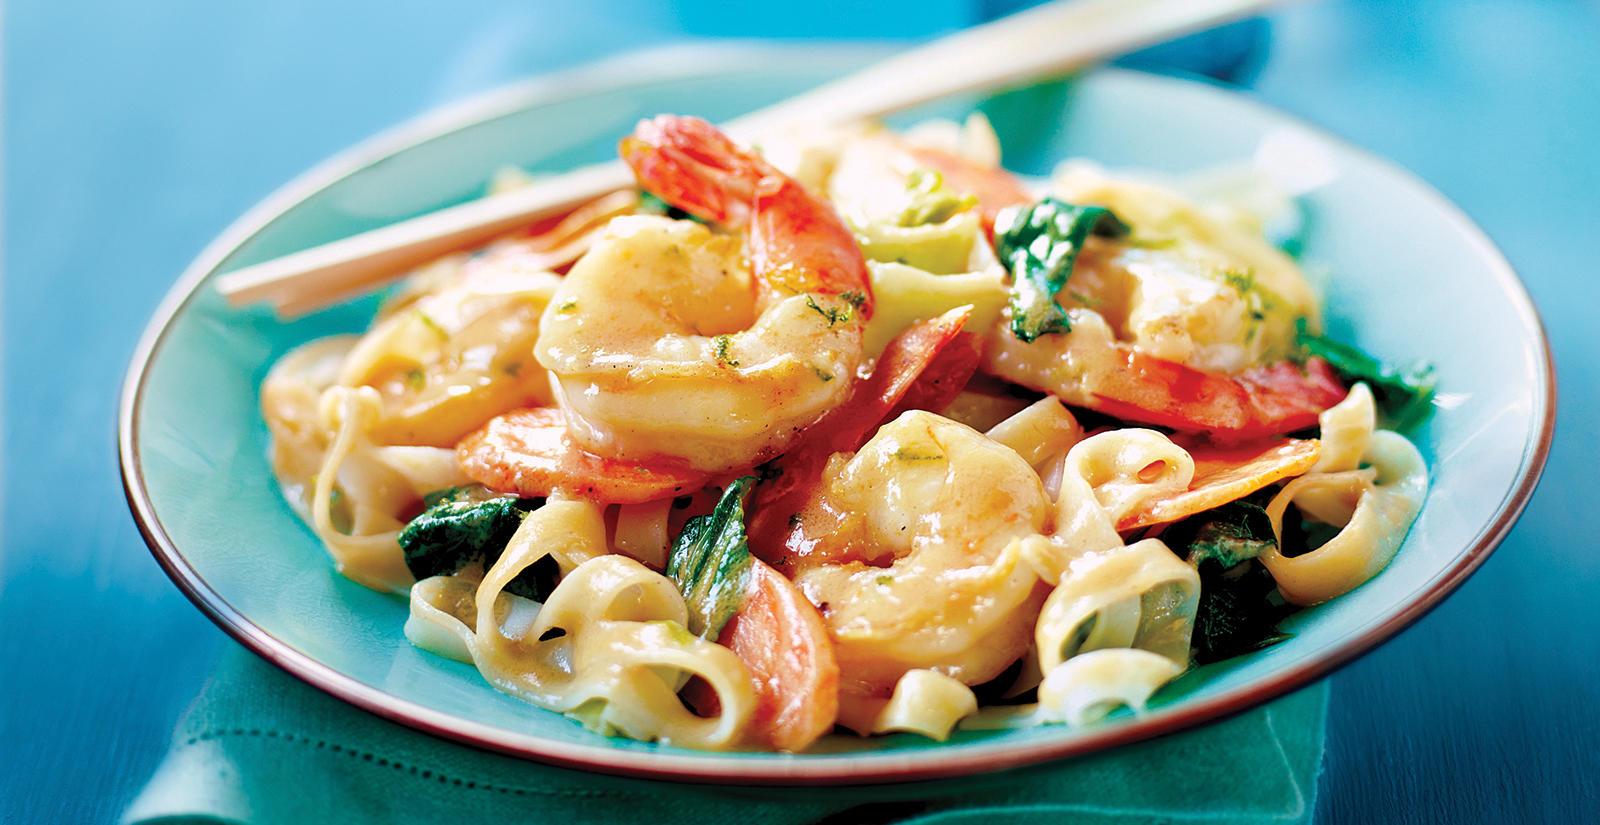 Sobeys | Peanut Shrimp with Bok Choy & Rice Noodles